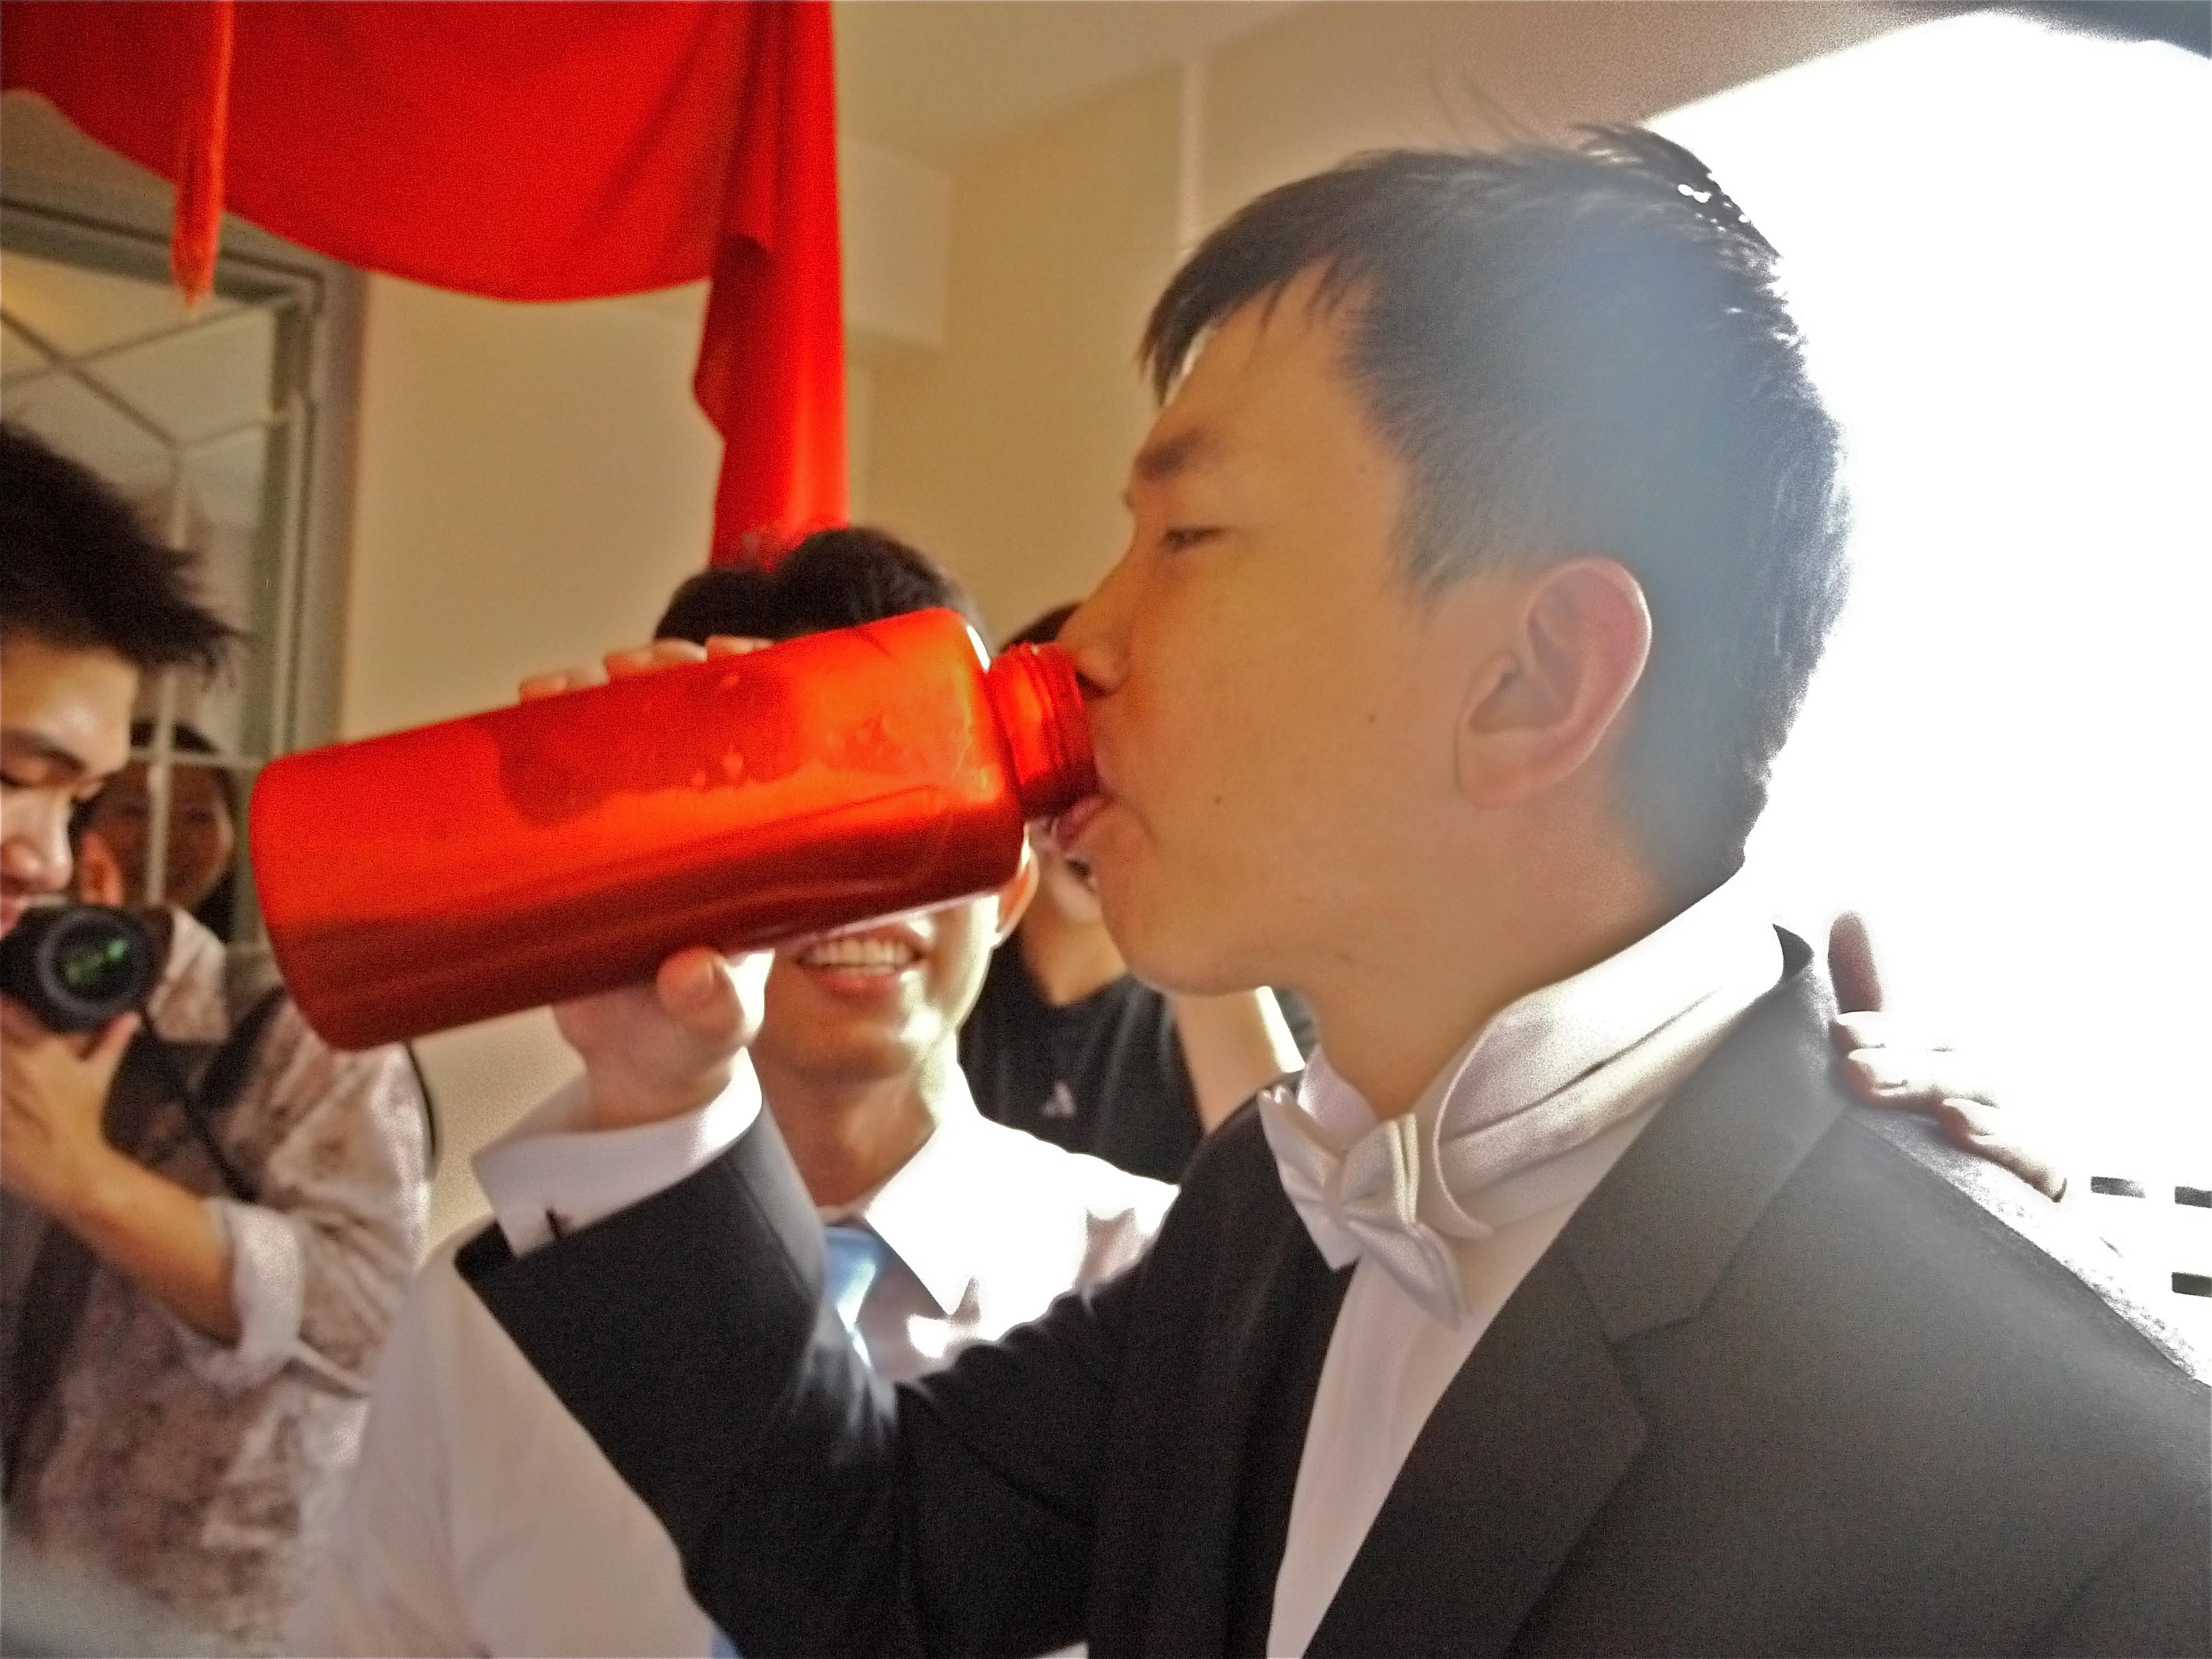 Chinese Wedding Door Games Wikipedia